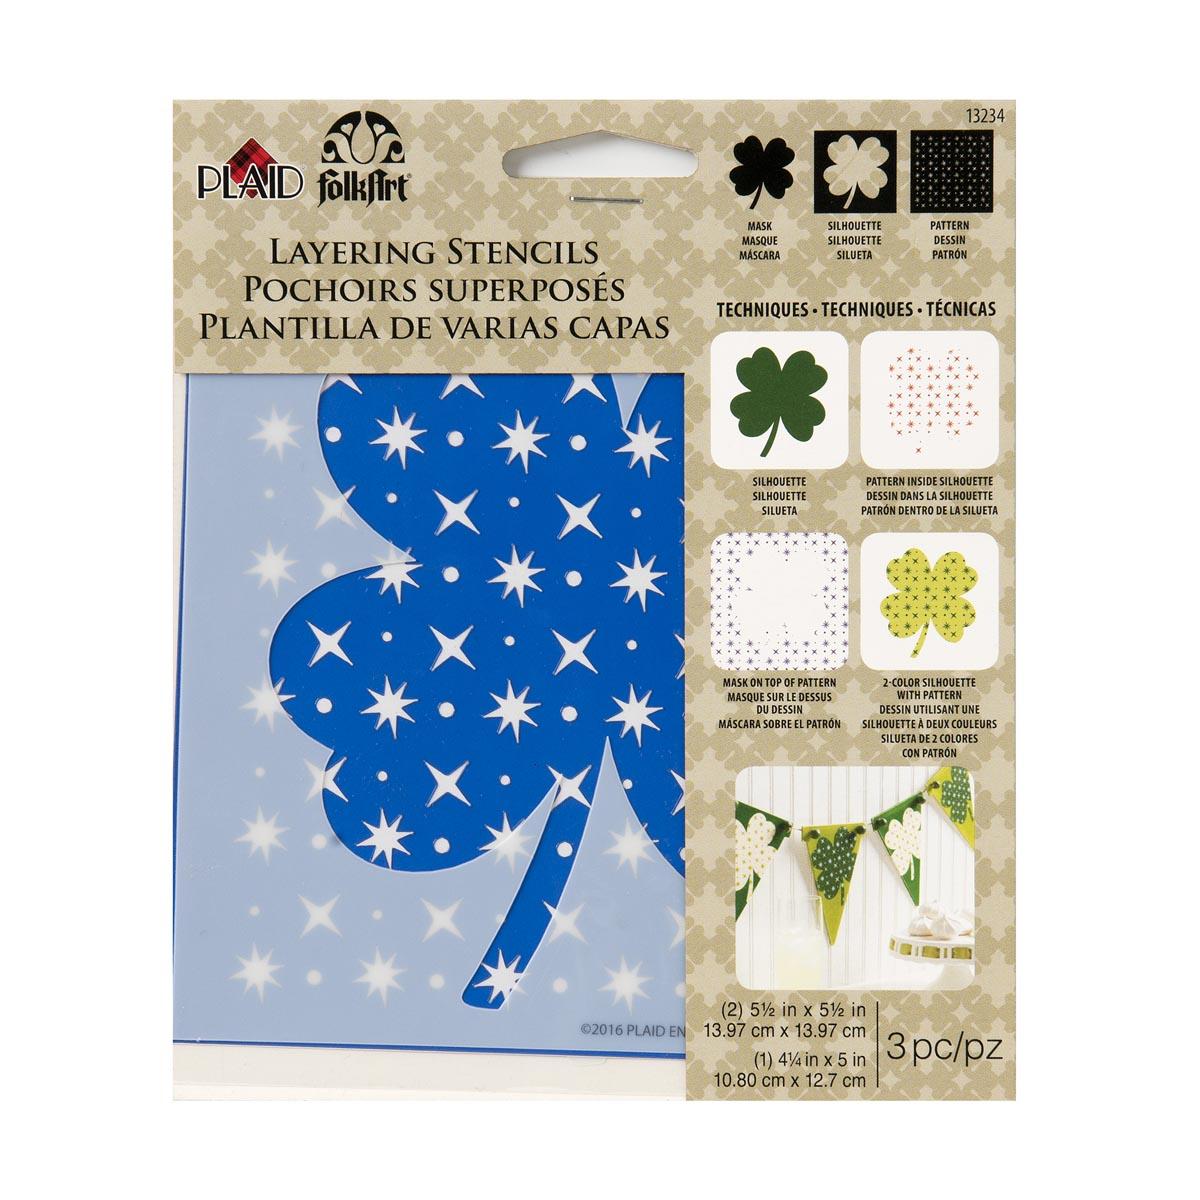 FolkArt ® Layering Stencils - Shamrock - 13234